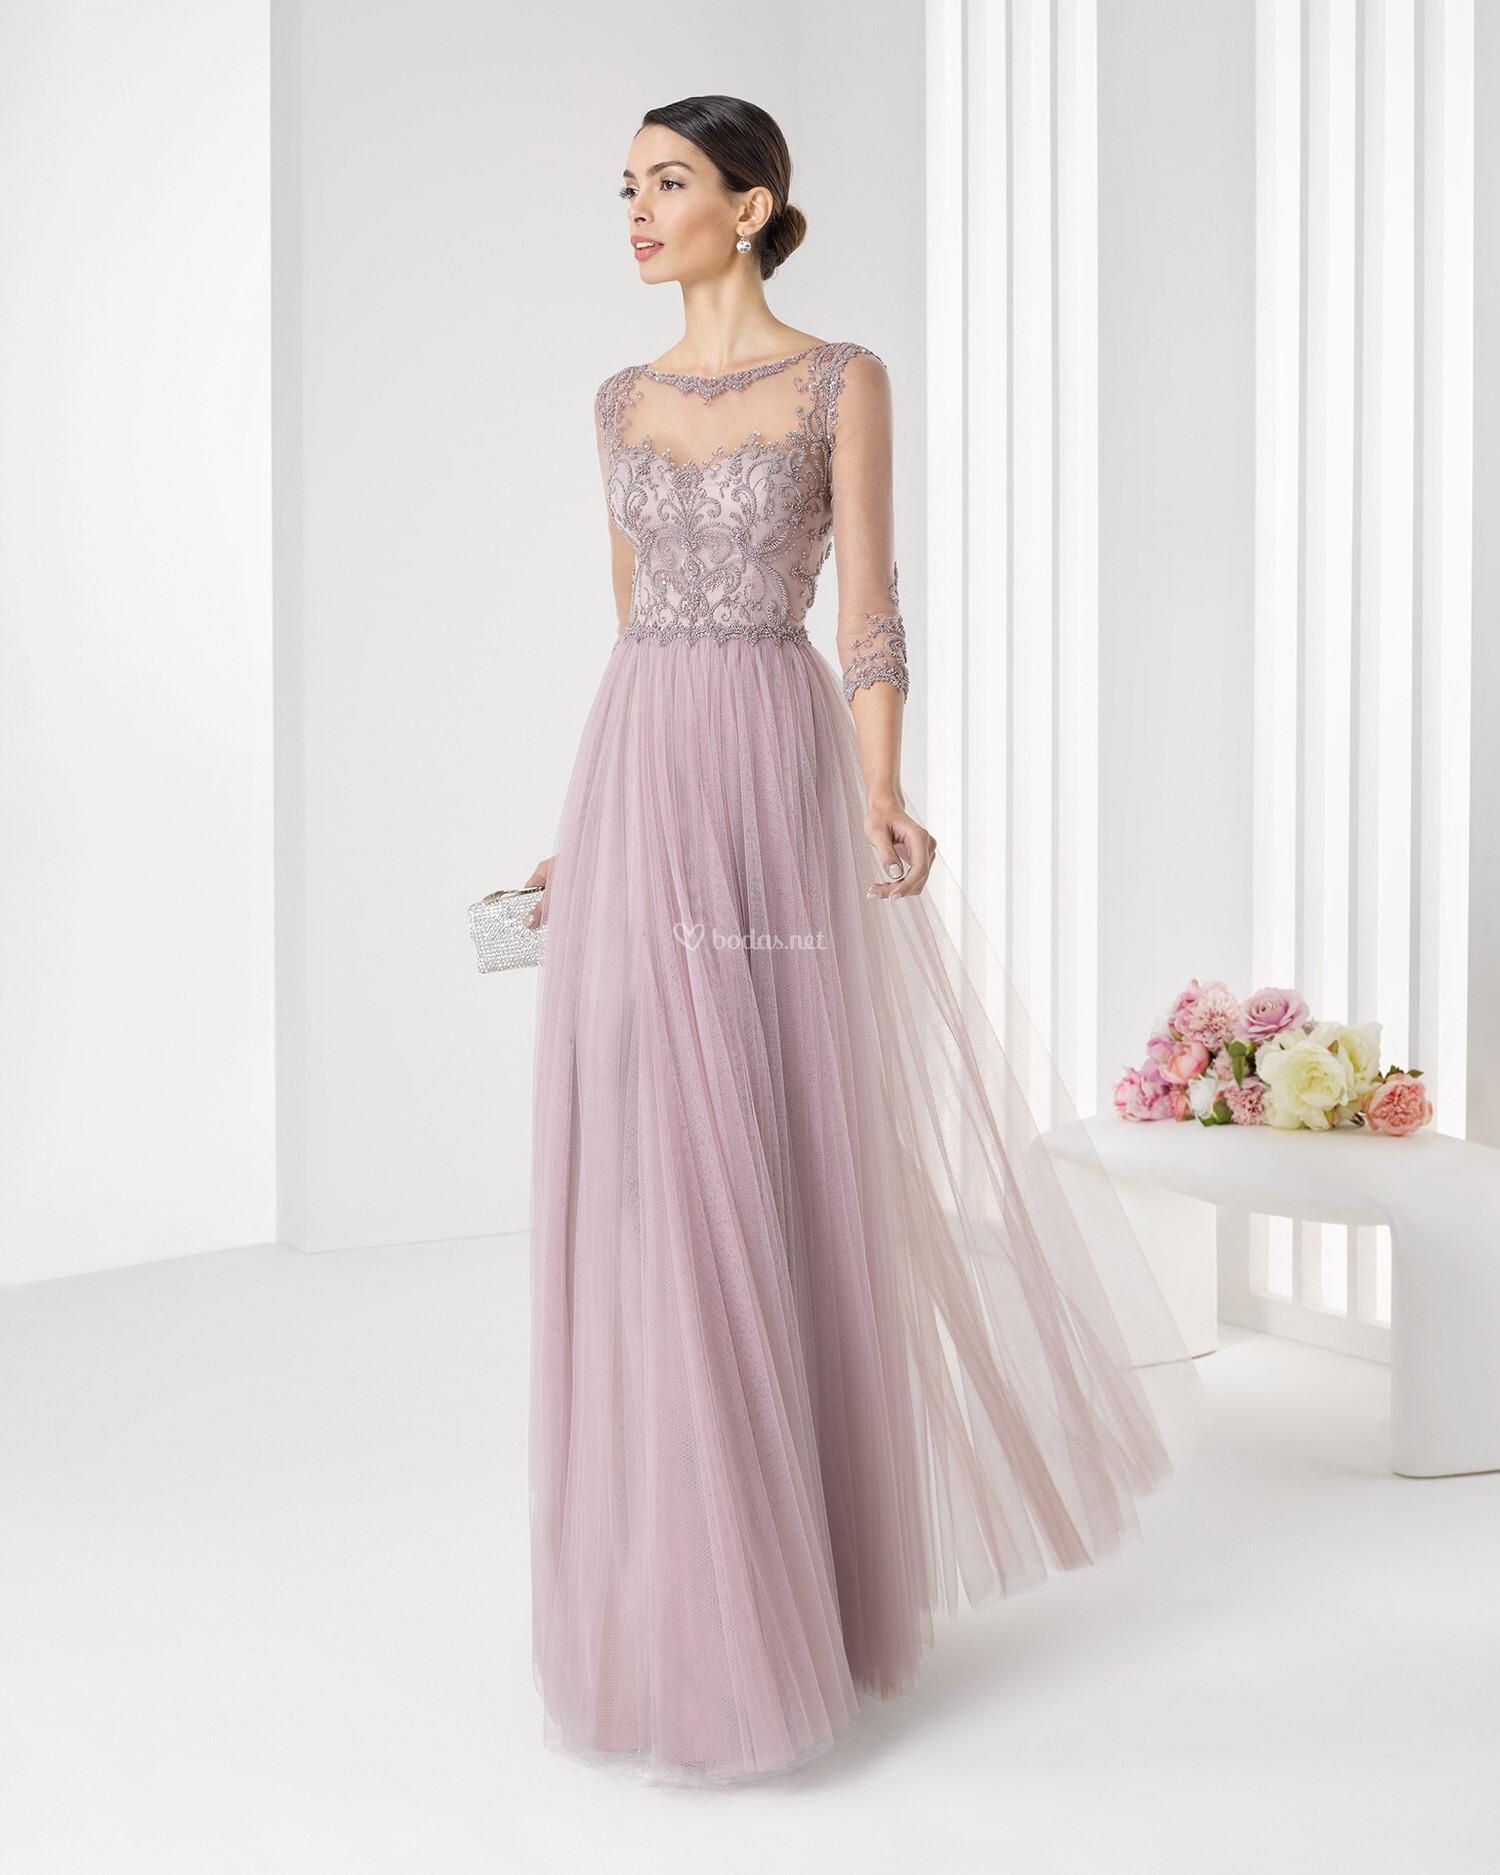 Vestidos fiesta boda rosa clara